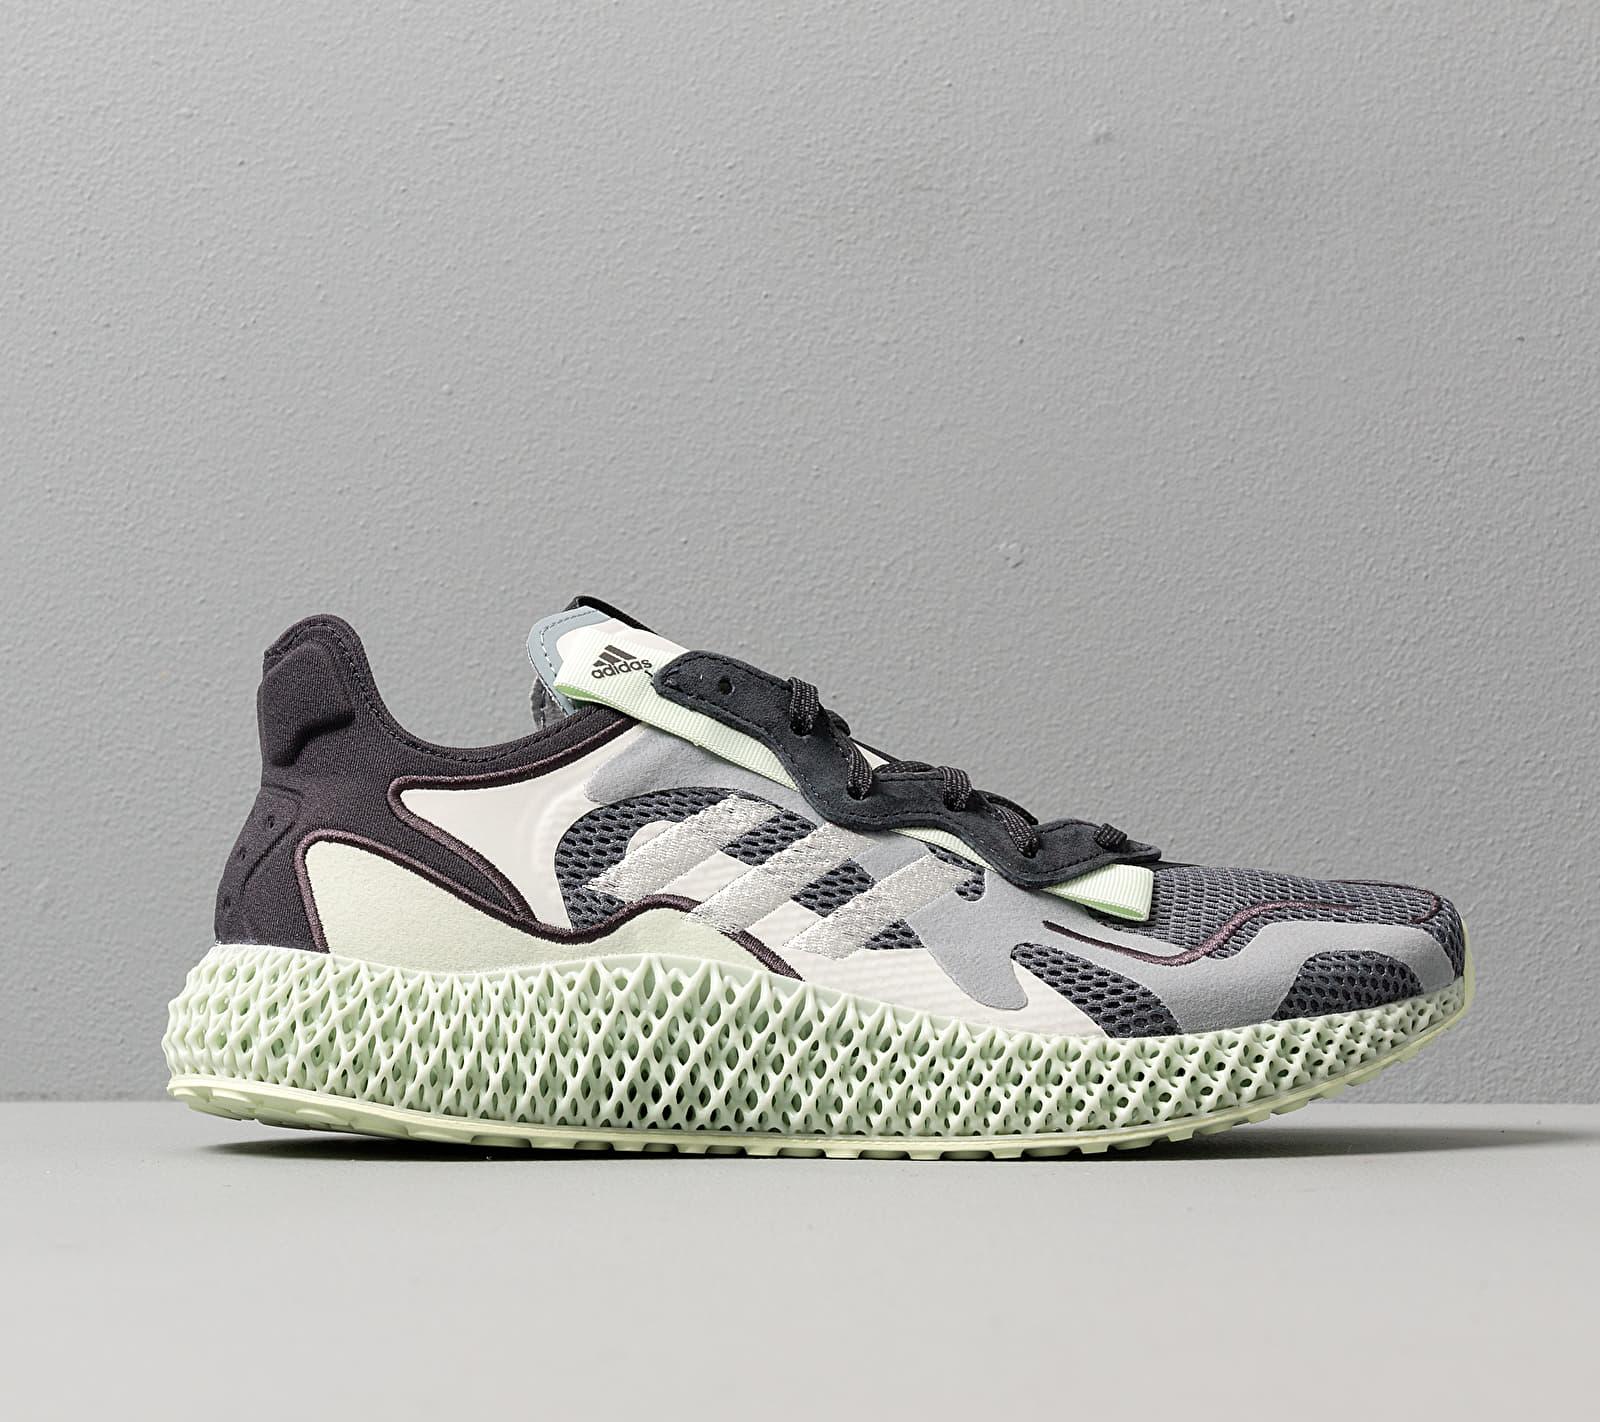 adidas Consortium Runner EVO 4D Onix/ White/ Light Green, Gray